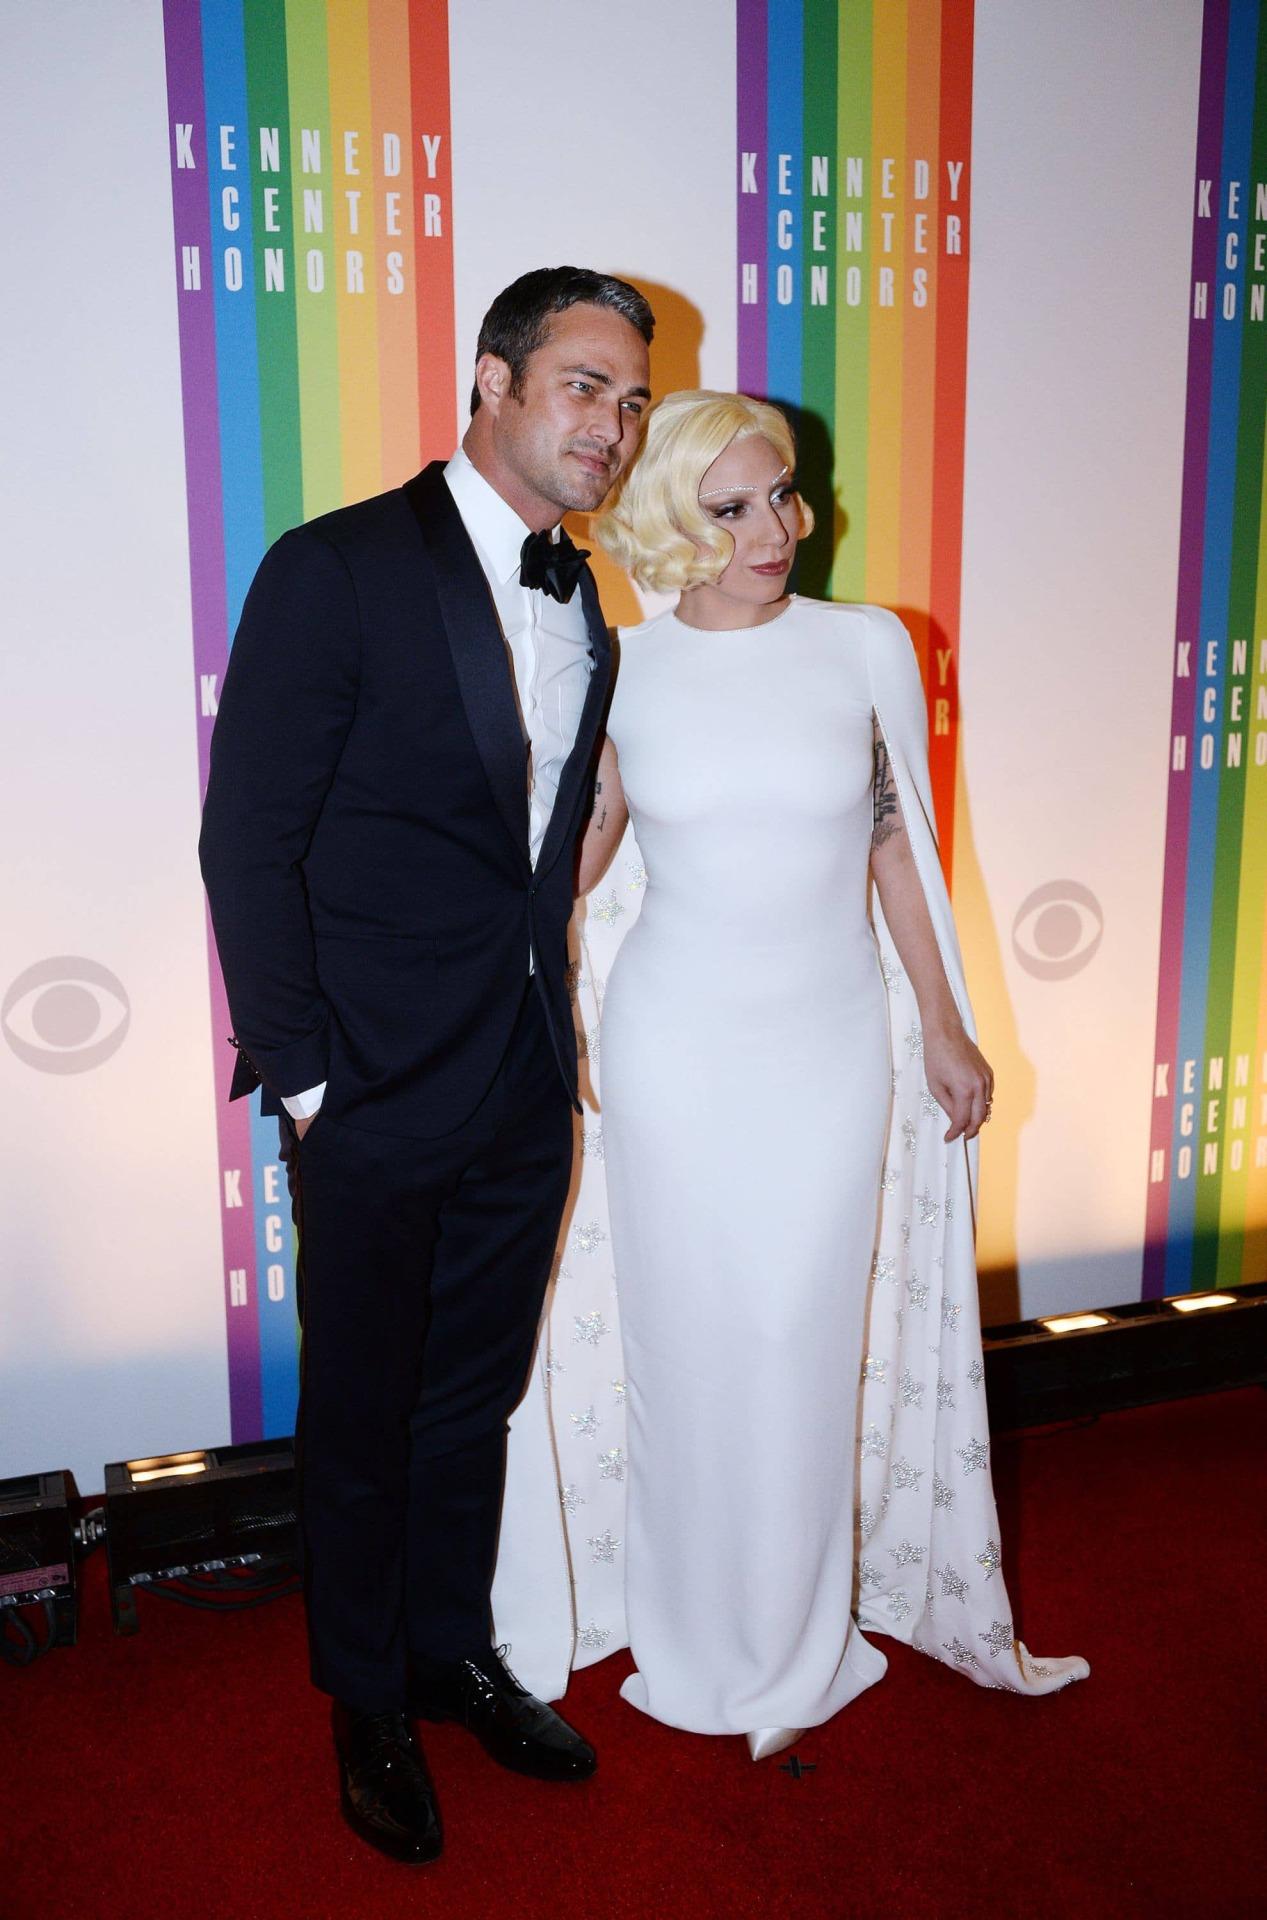 Lady Gaga and Taylor Kinney. - Page 2 Tumblr_ng9ie4VyYg1rz7rr7o1_1280